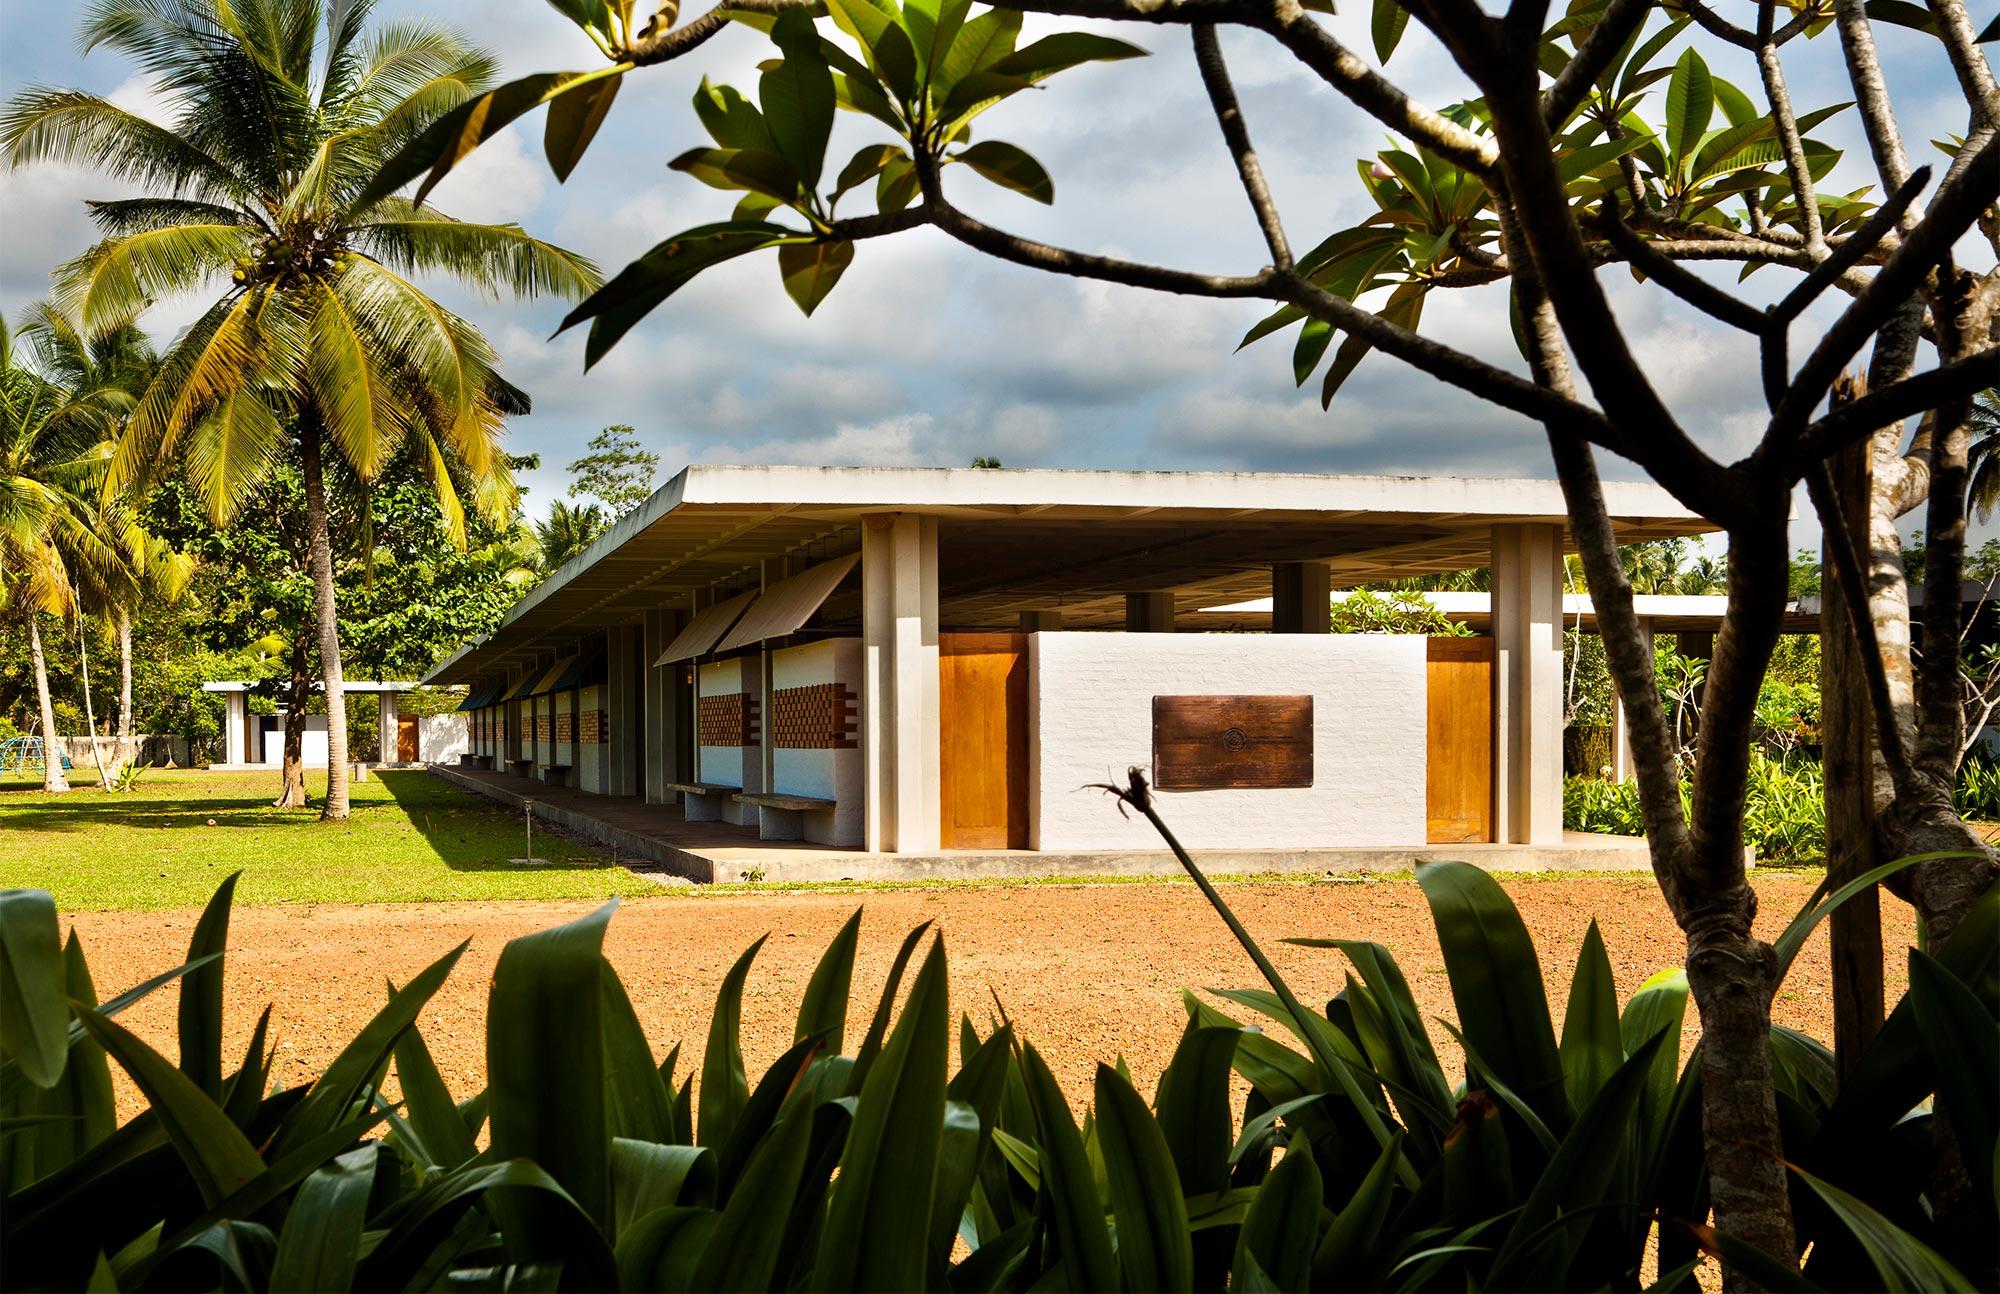 Schulcampus der one world foundation in Ahungalla, Sri Lanka, Foto: Thomas Wirthensohn